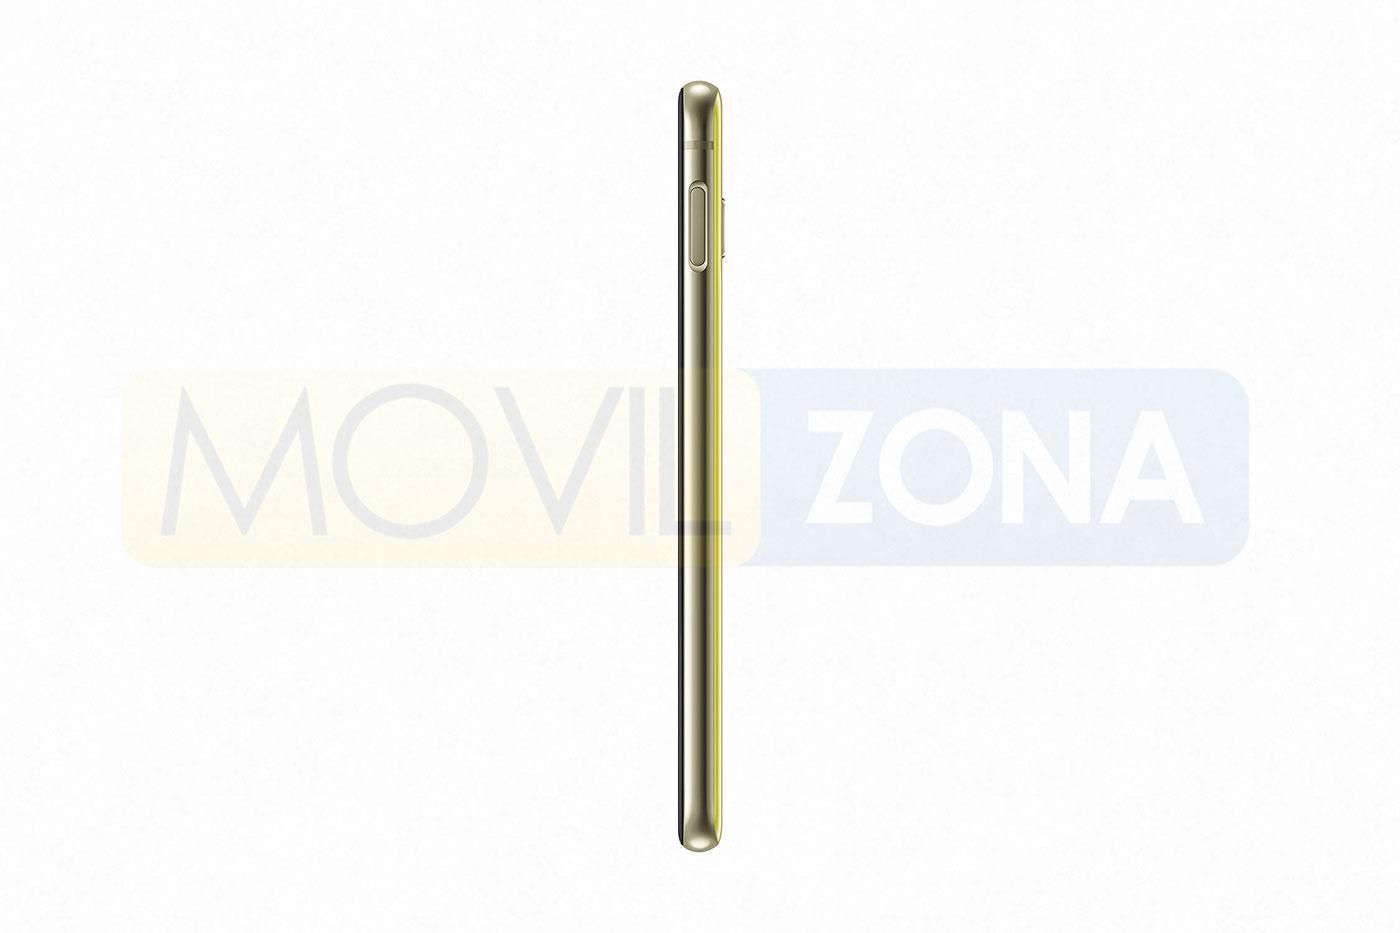 Samsung Galaxy S10e lateral